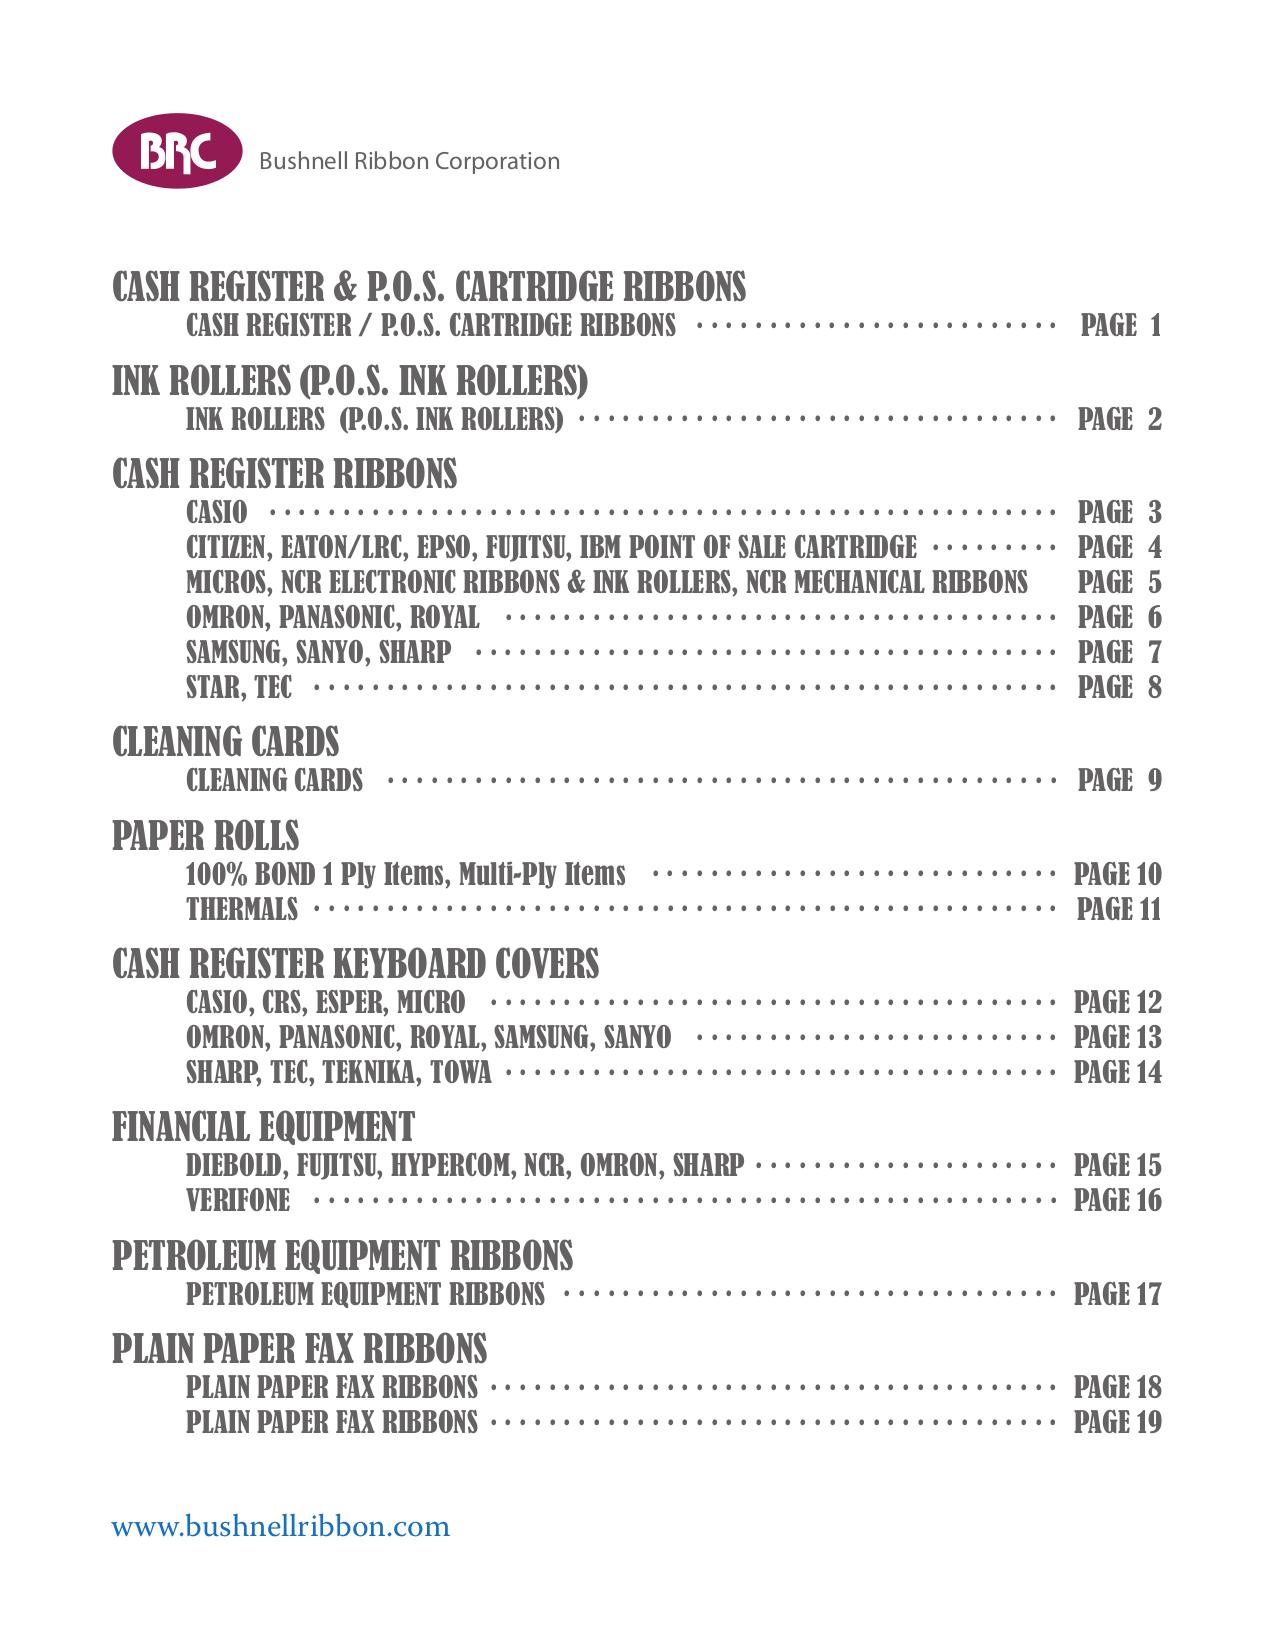 PDF manual for Sharp Fax Machine UX-A255